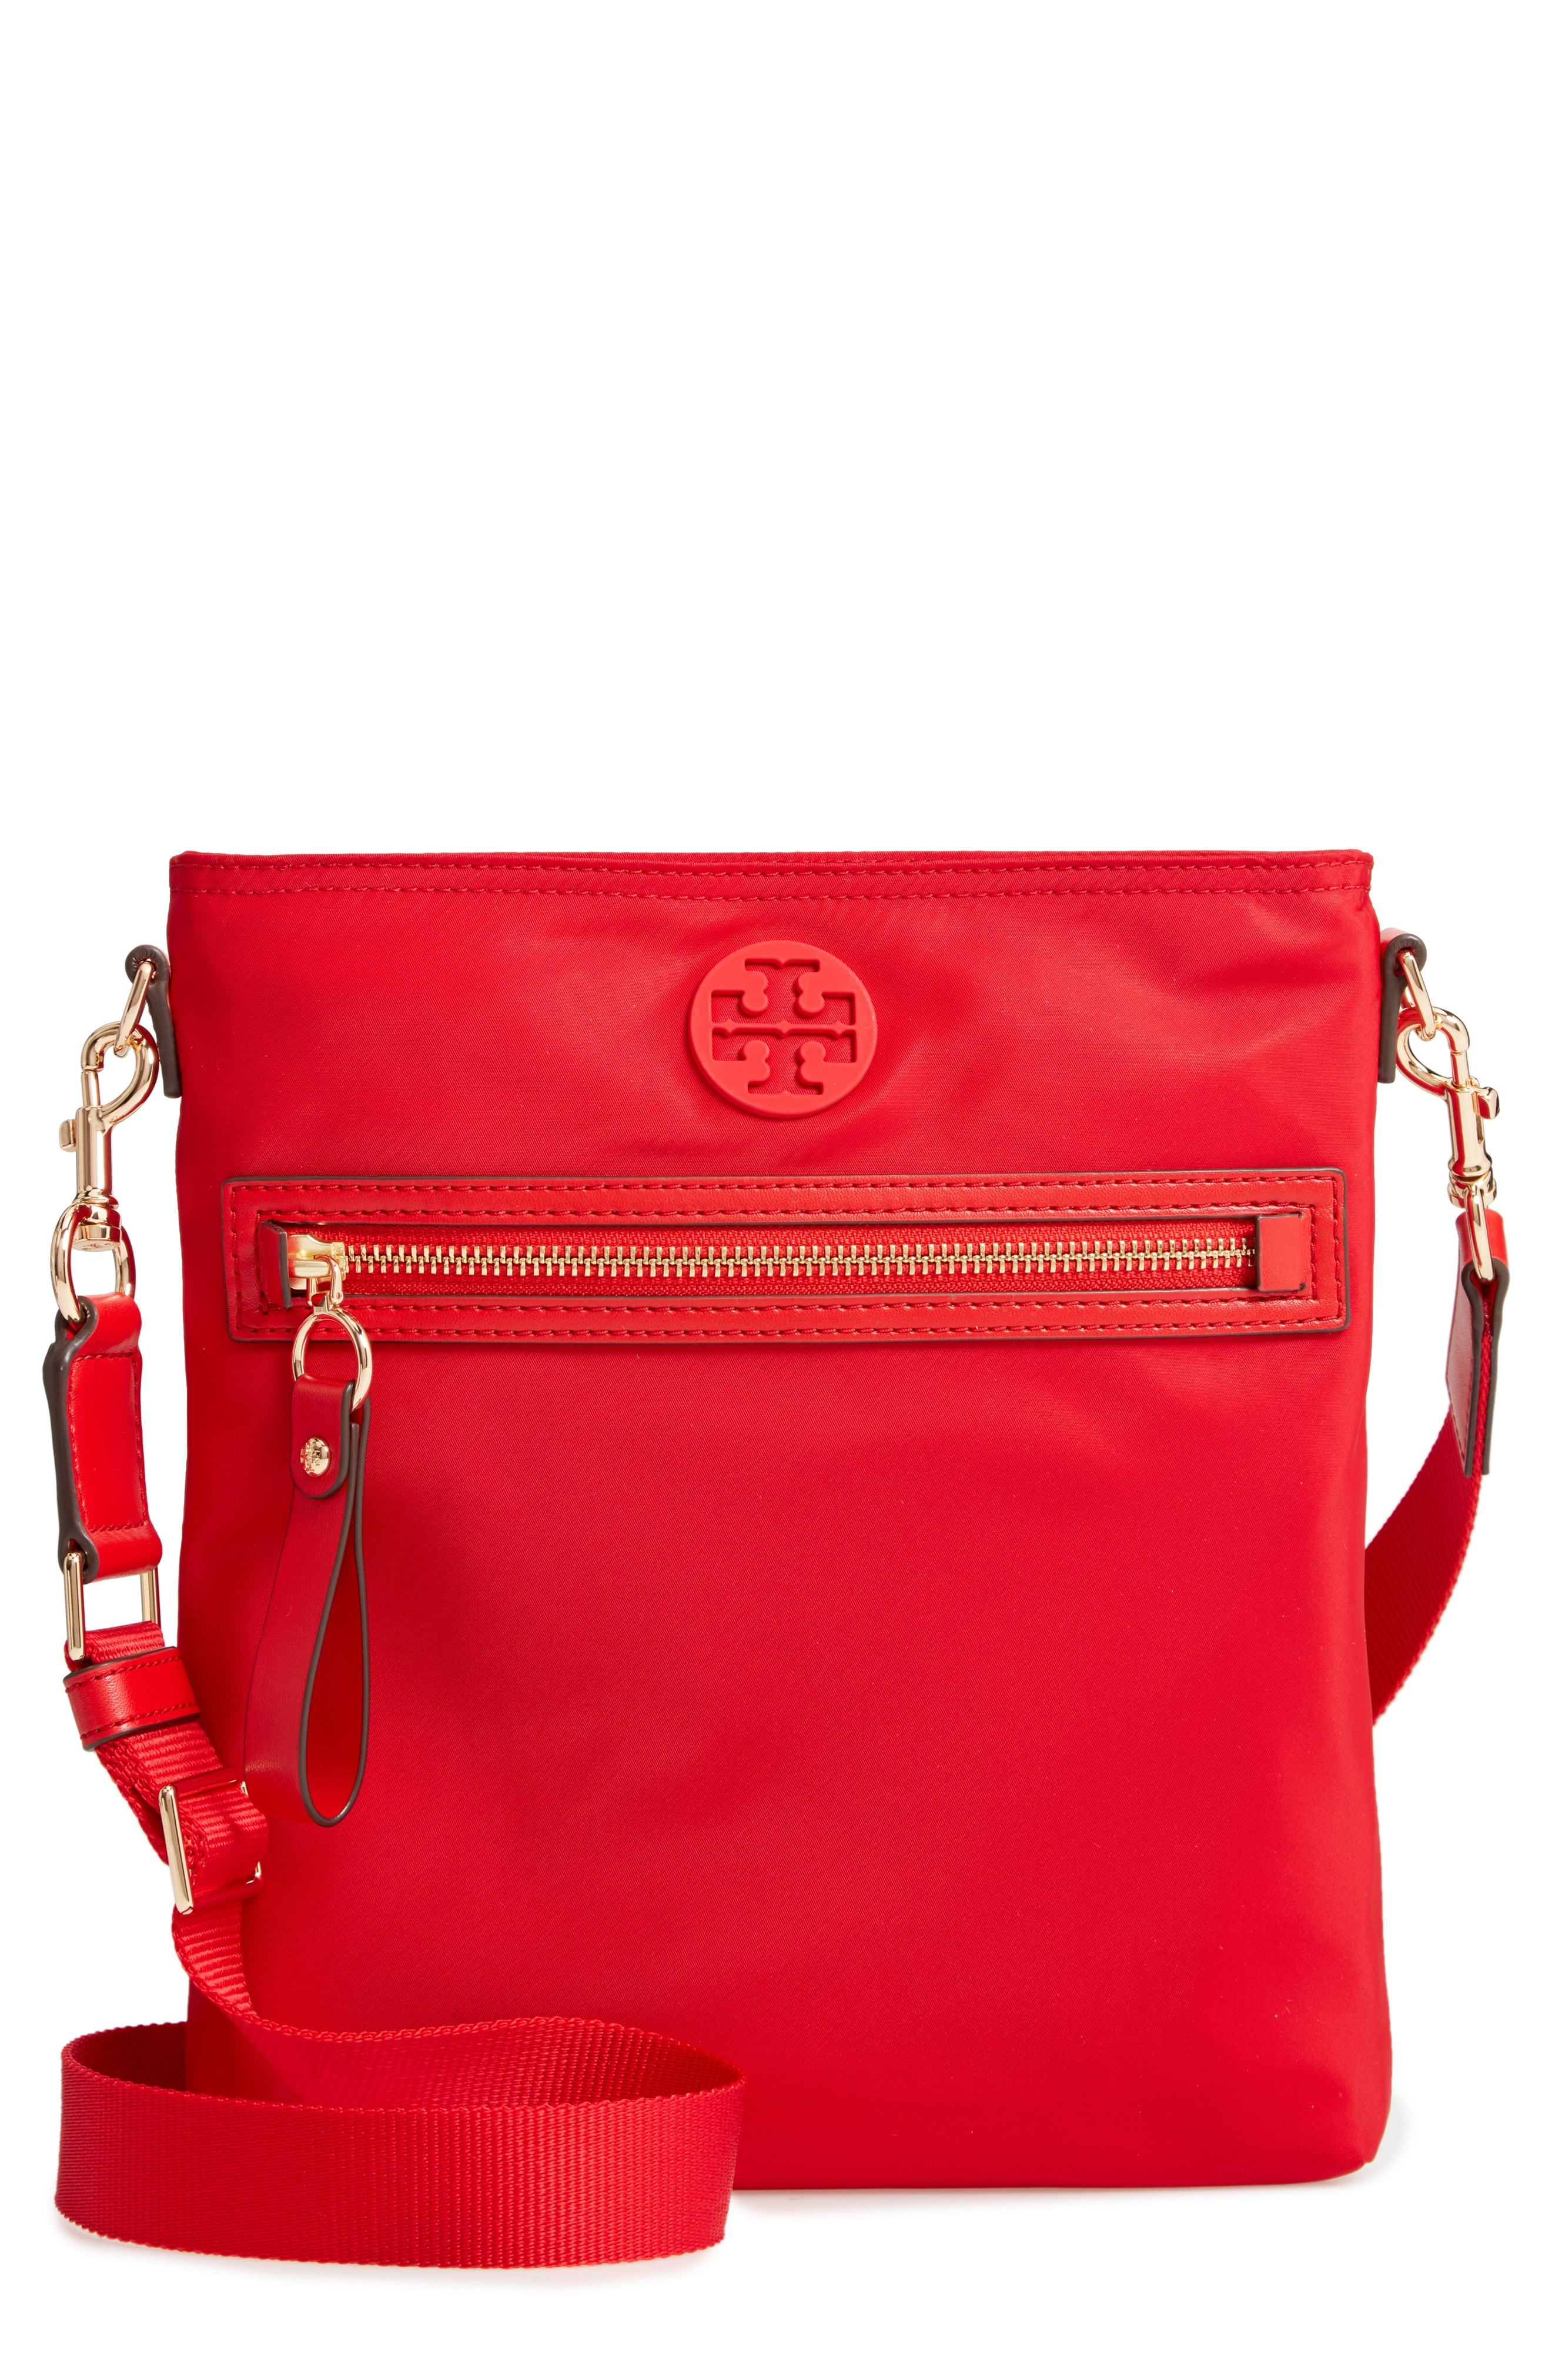 8984b9b0e Tory Burch Tilda Nylon Swingpack, $178 | Nordstrom | Lookastic.com